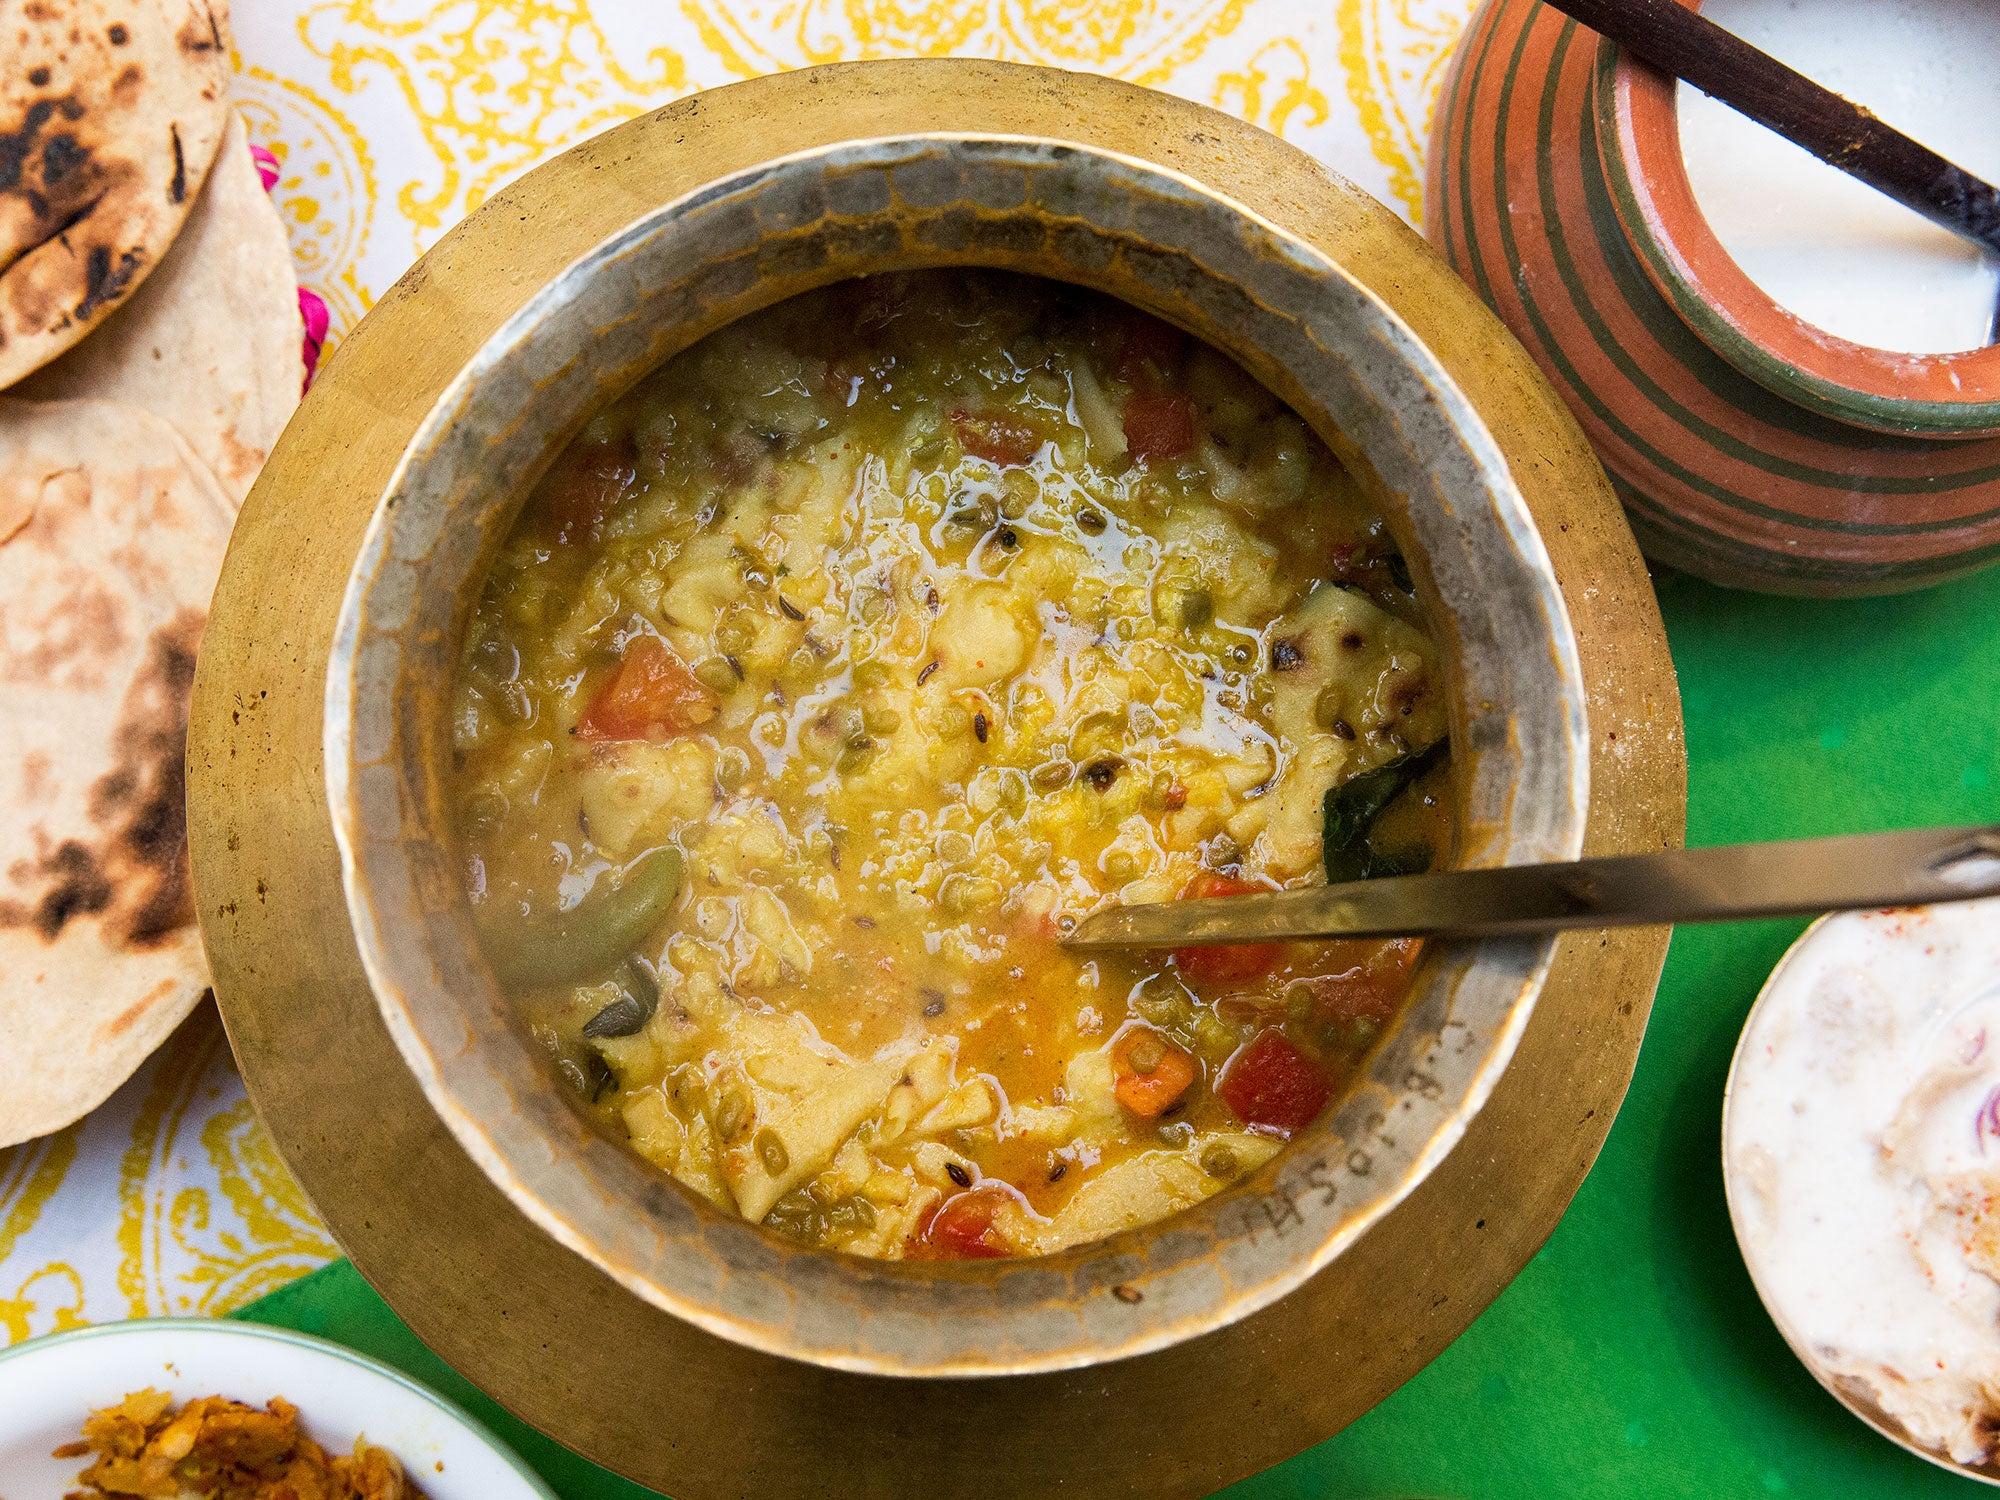 Dal Dhokli (Indian Roti and Lentil Stew)